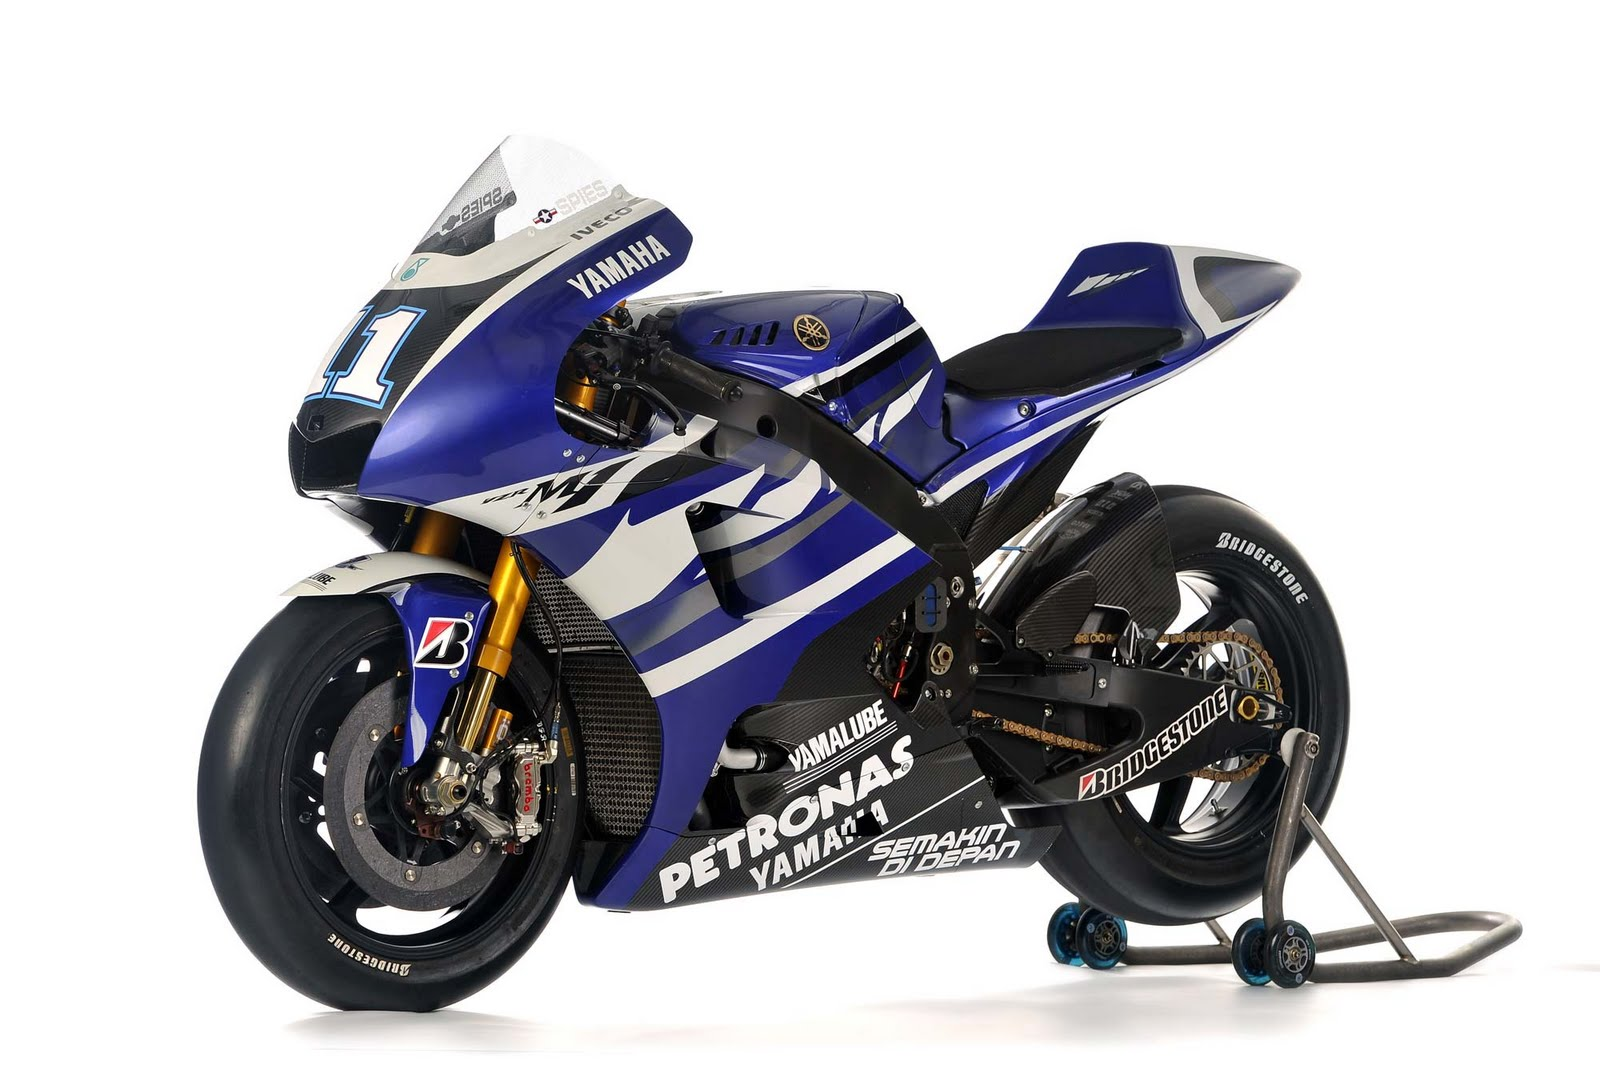 http://1.bp.blogspot.com/-E0aJ7aLHxxs/ThQm41q_3wI/AAAAAAAAA-g/42cpQdNKkhM/s1600/Yamaha+YZR-M1+MotoGP+Wallpapers2.jpg